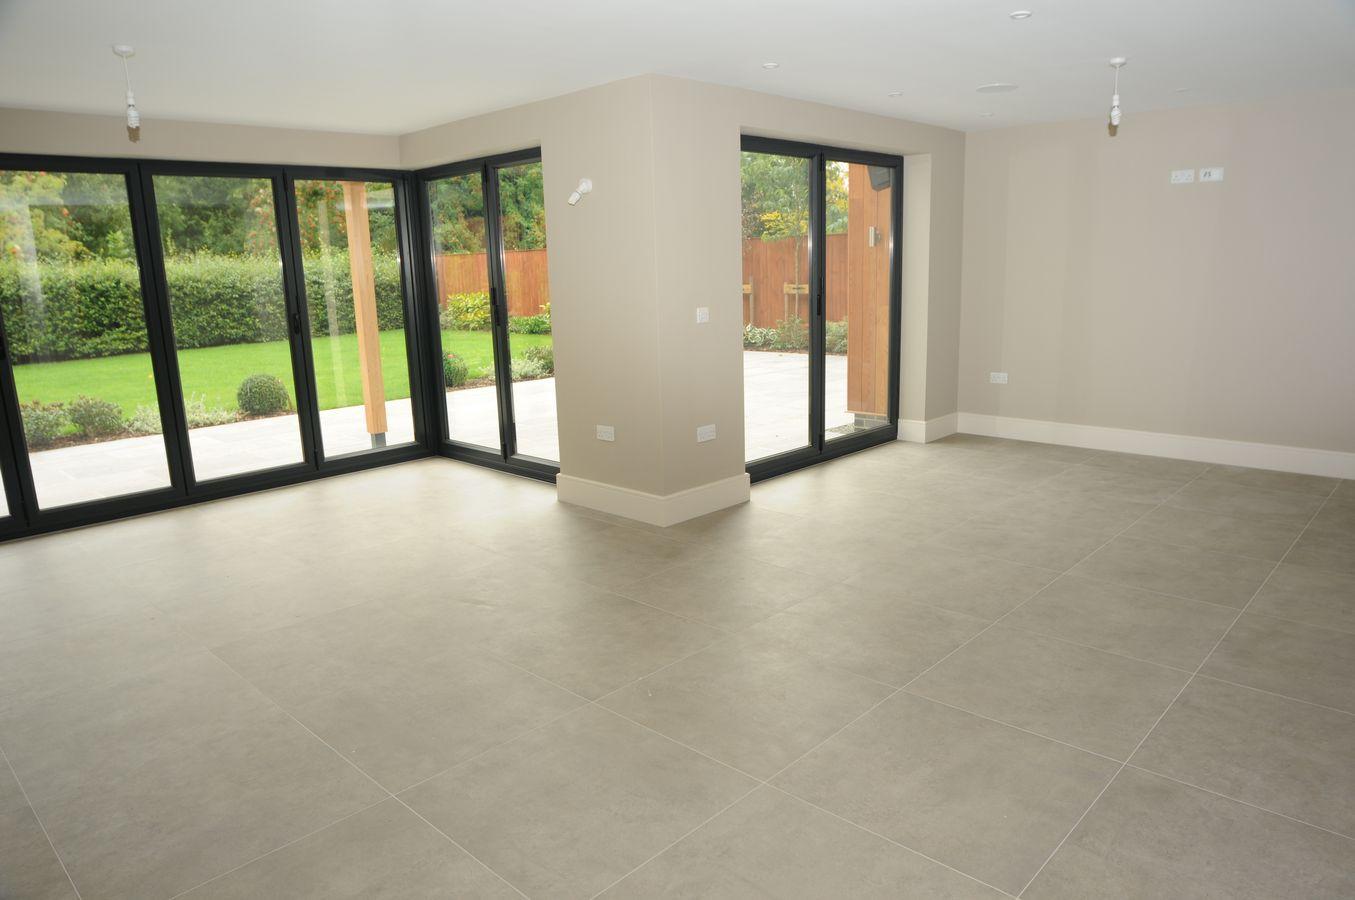 Big empty living room - Daincourt Bulcote House Big Empty Livingroom